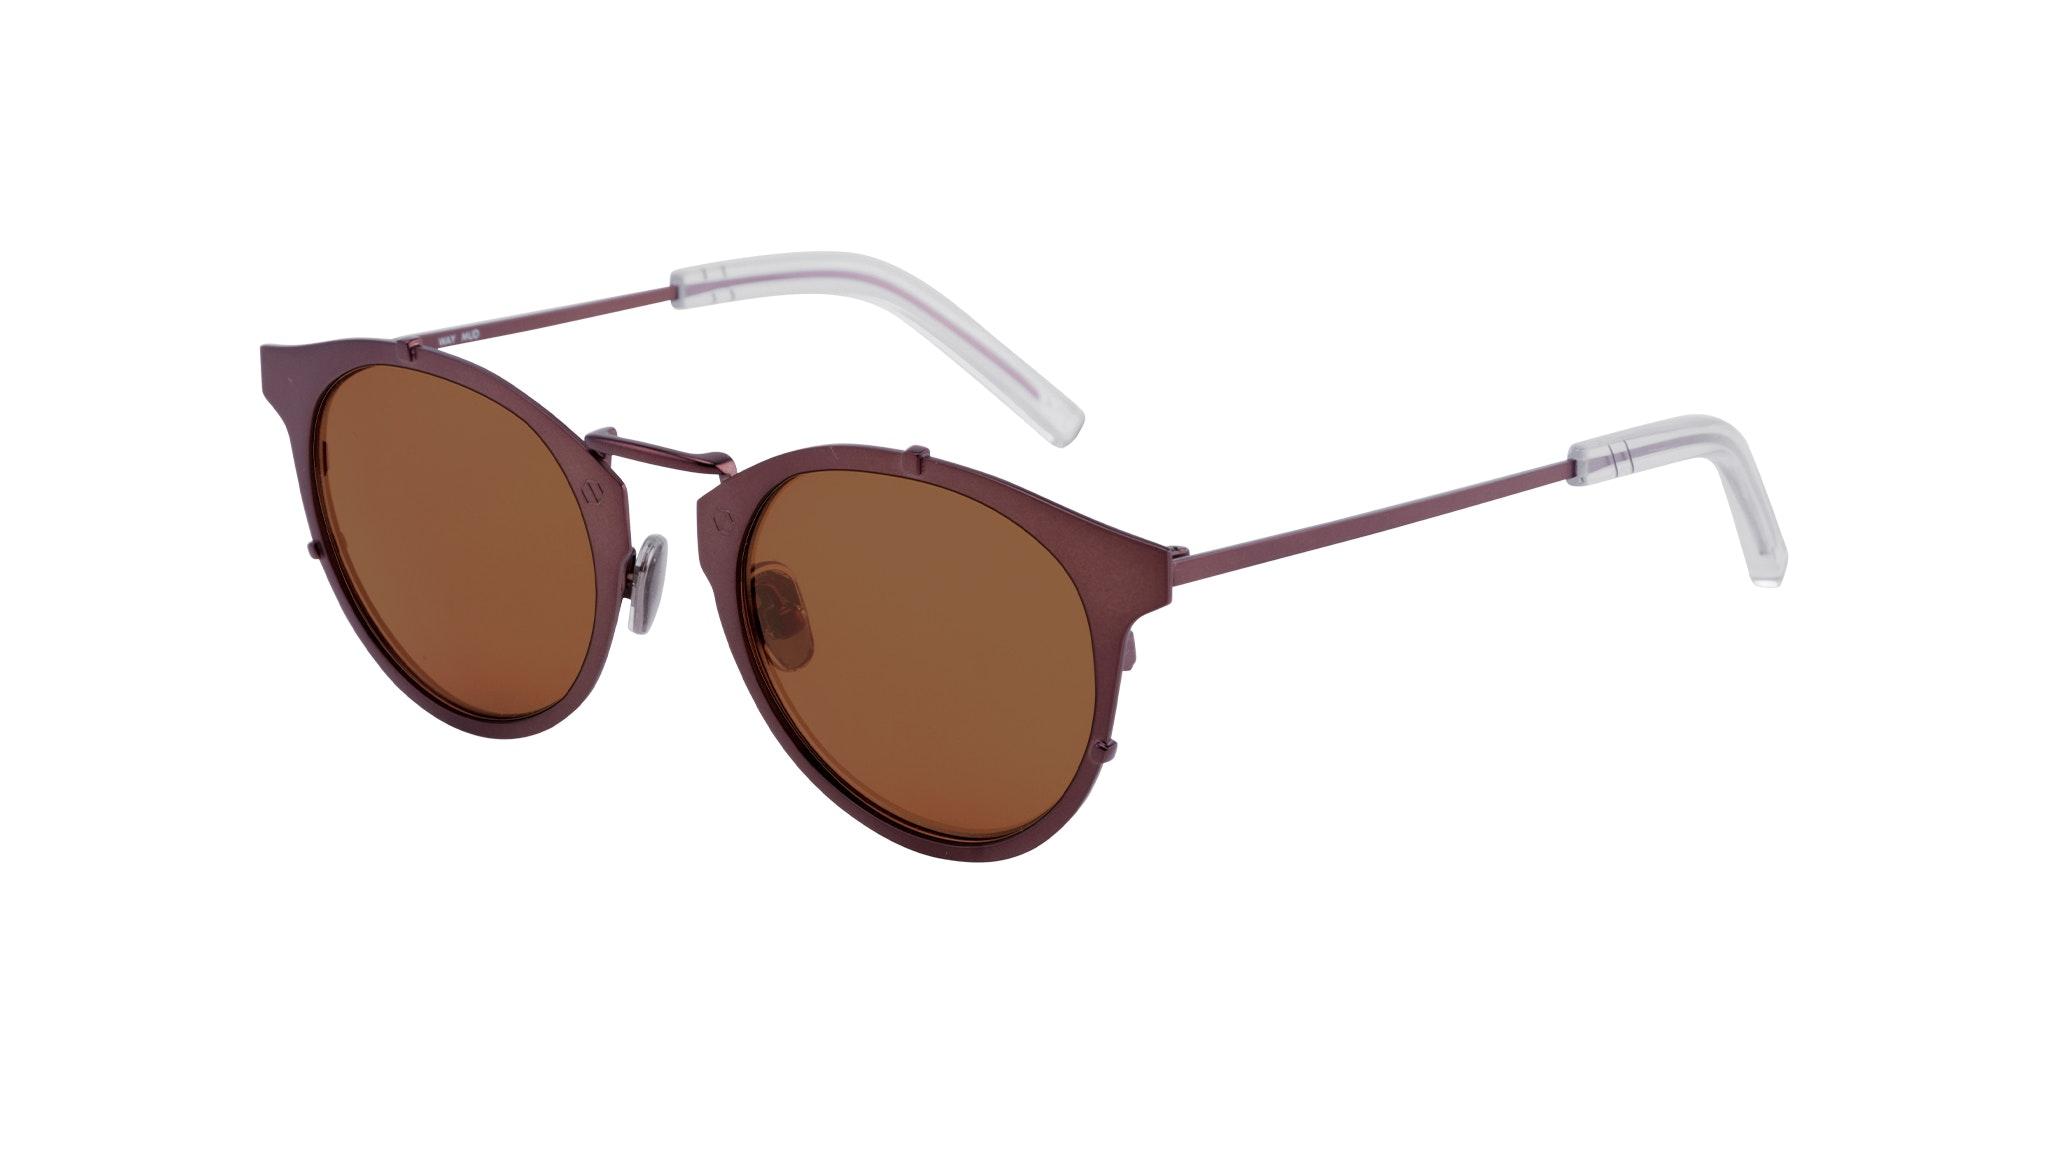 Affordable Fashion Glasses Round Sunglasses Men Way Mud Tilt